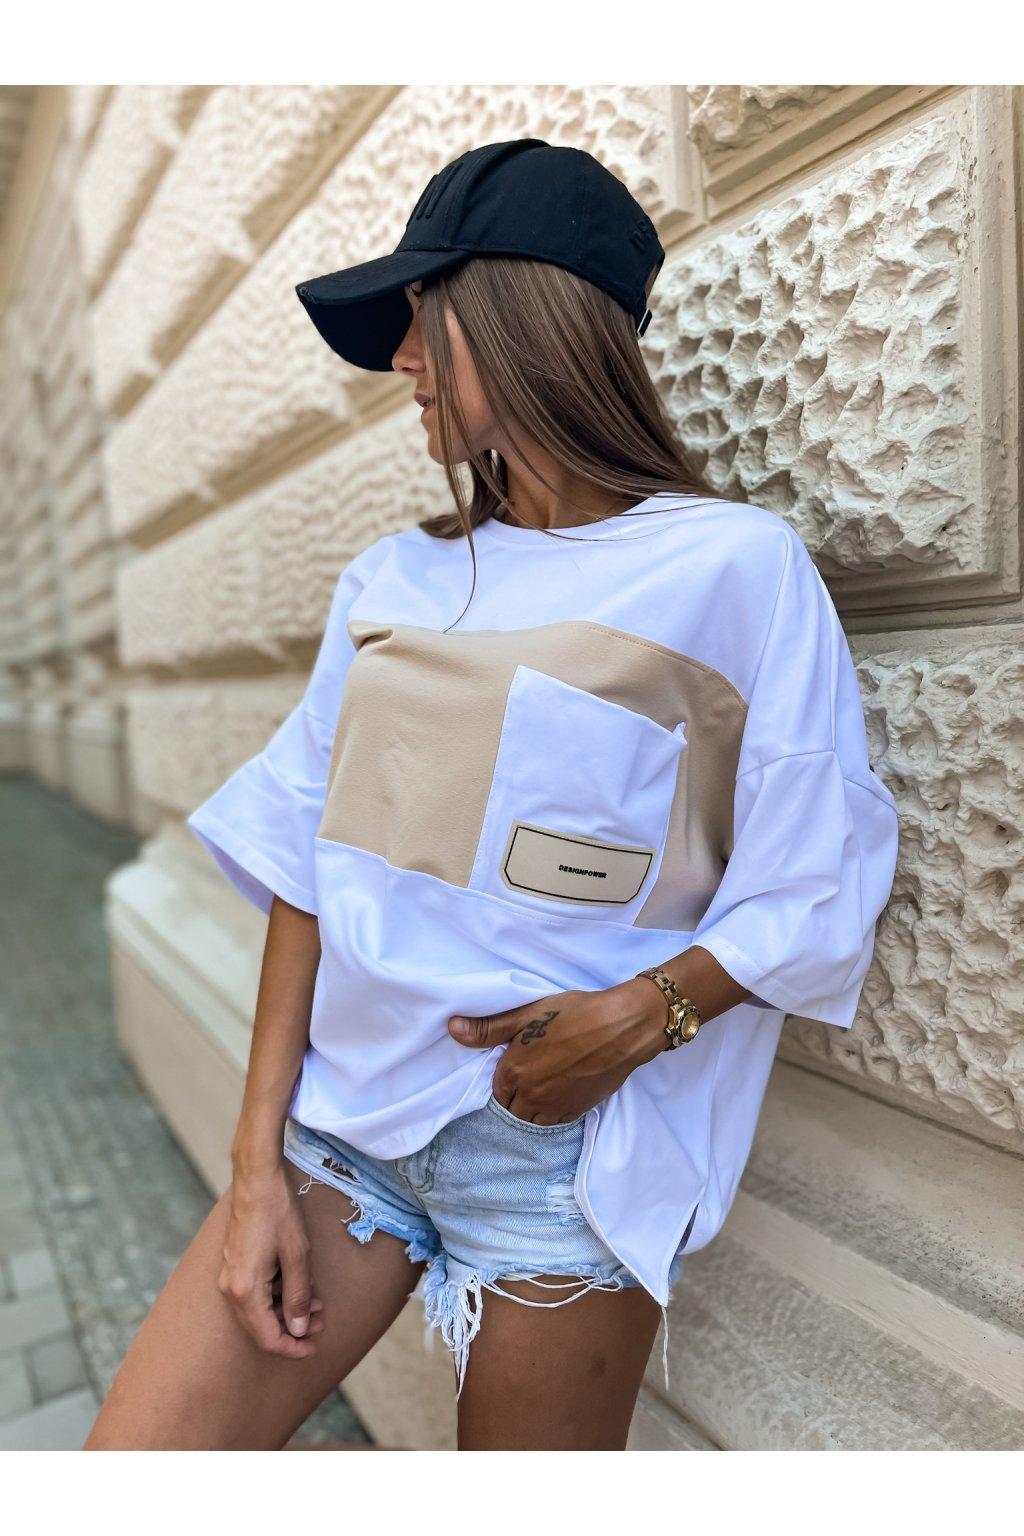 damske oversize tricko s kapsou design white beige eshopat cz 1